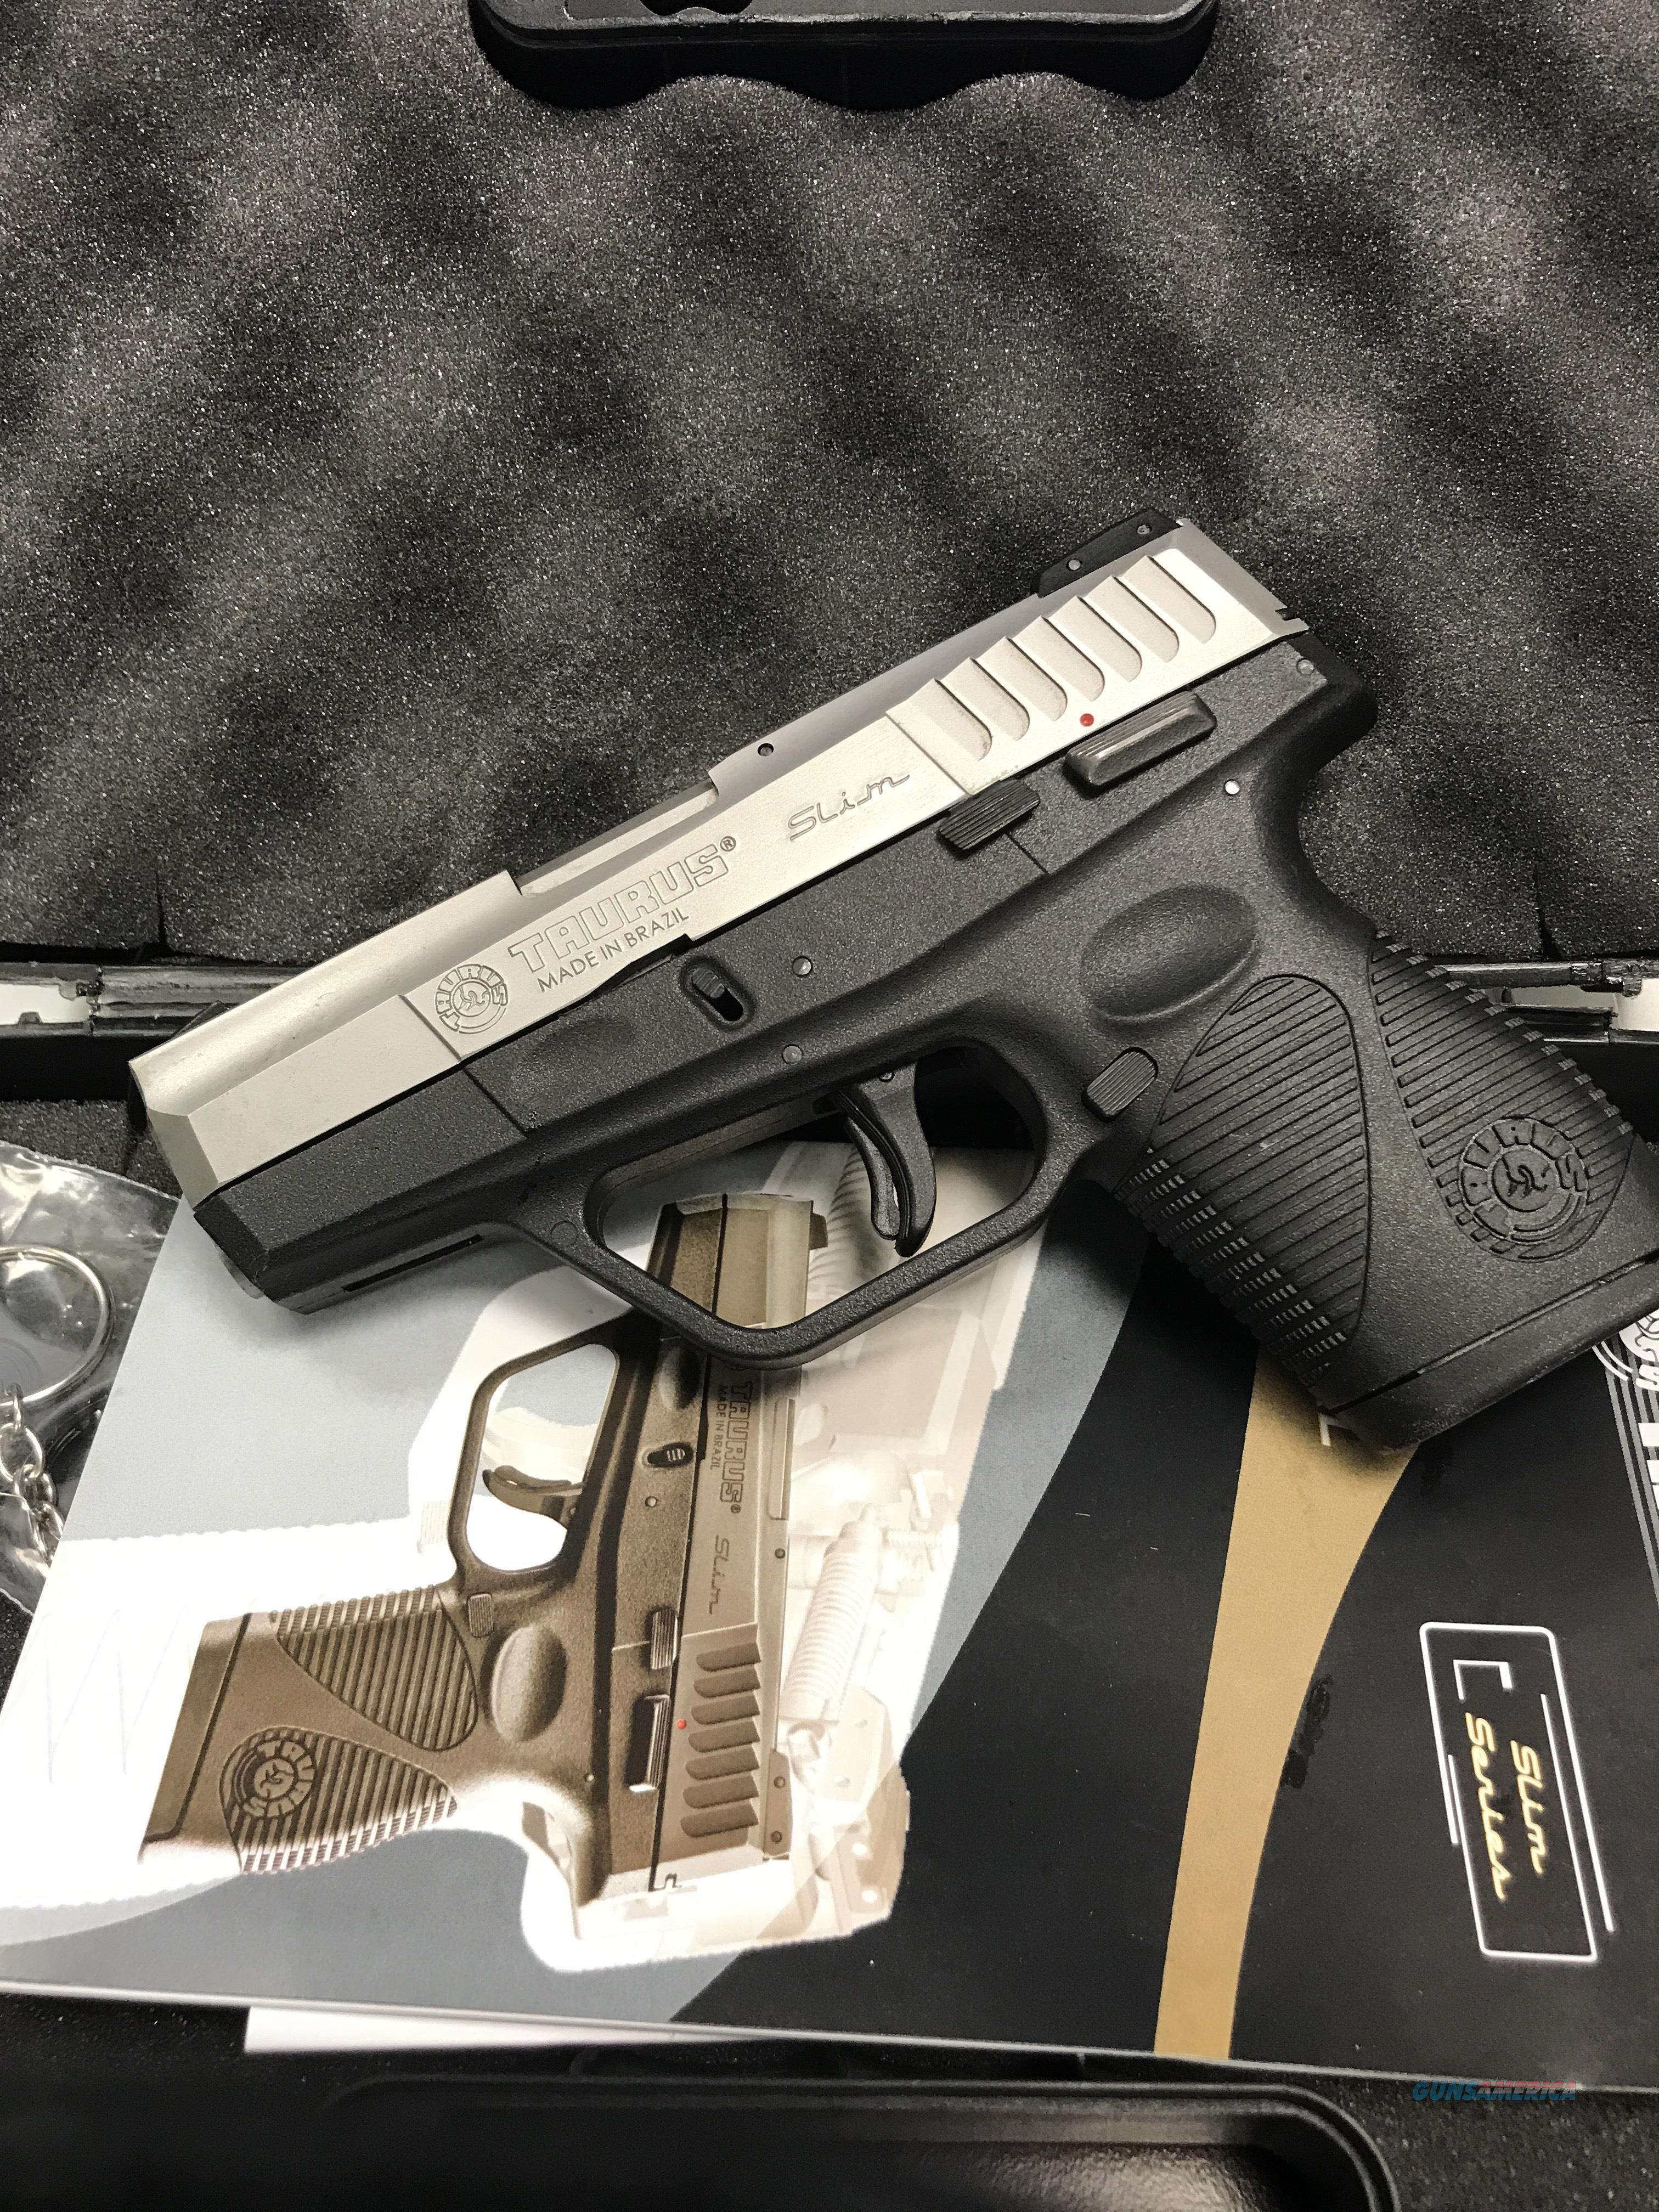 TAURUS SLIM 40S&W       FREE SHIPPING  Guns > Pistols > Taurus Pistols > Semi Auto Pistols > Polymer Frame